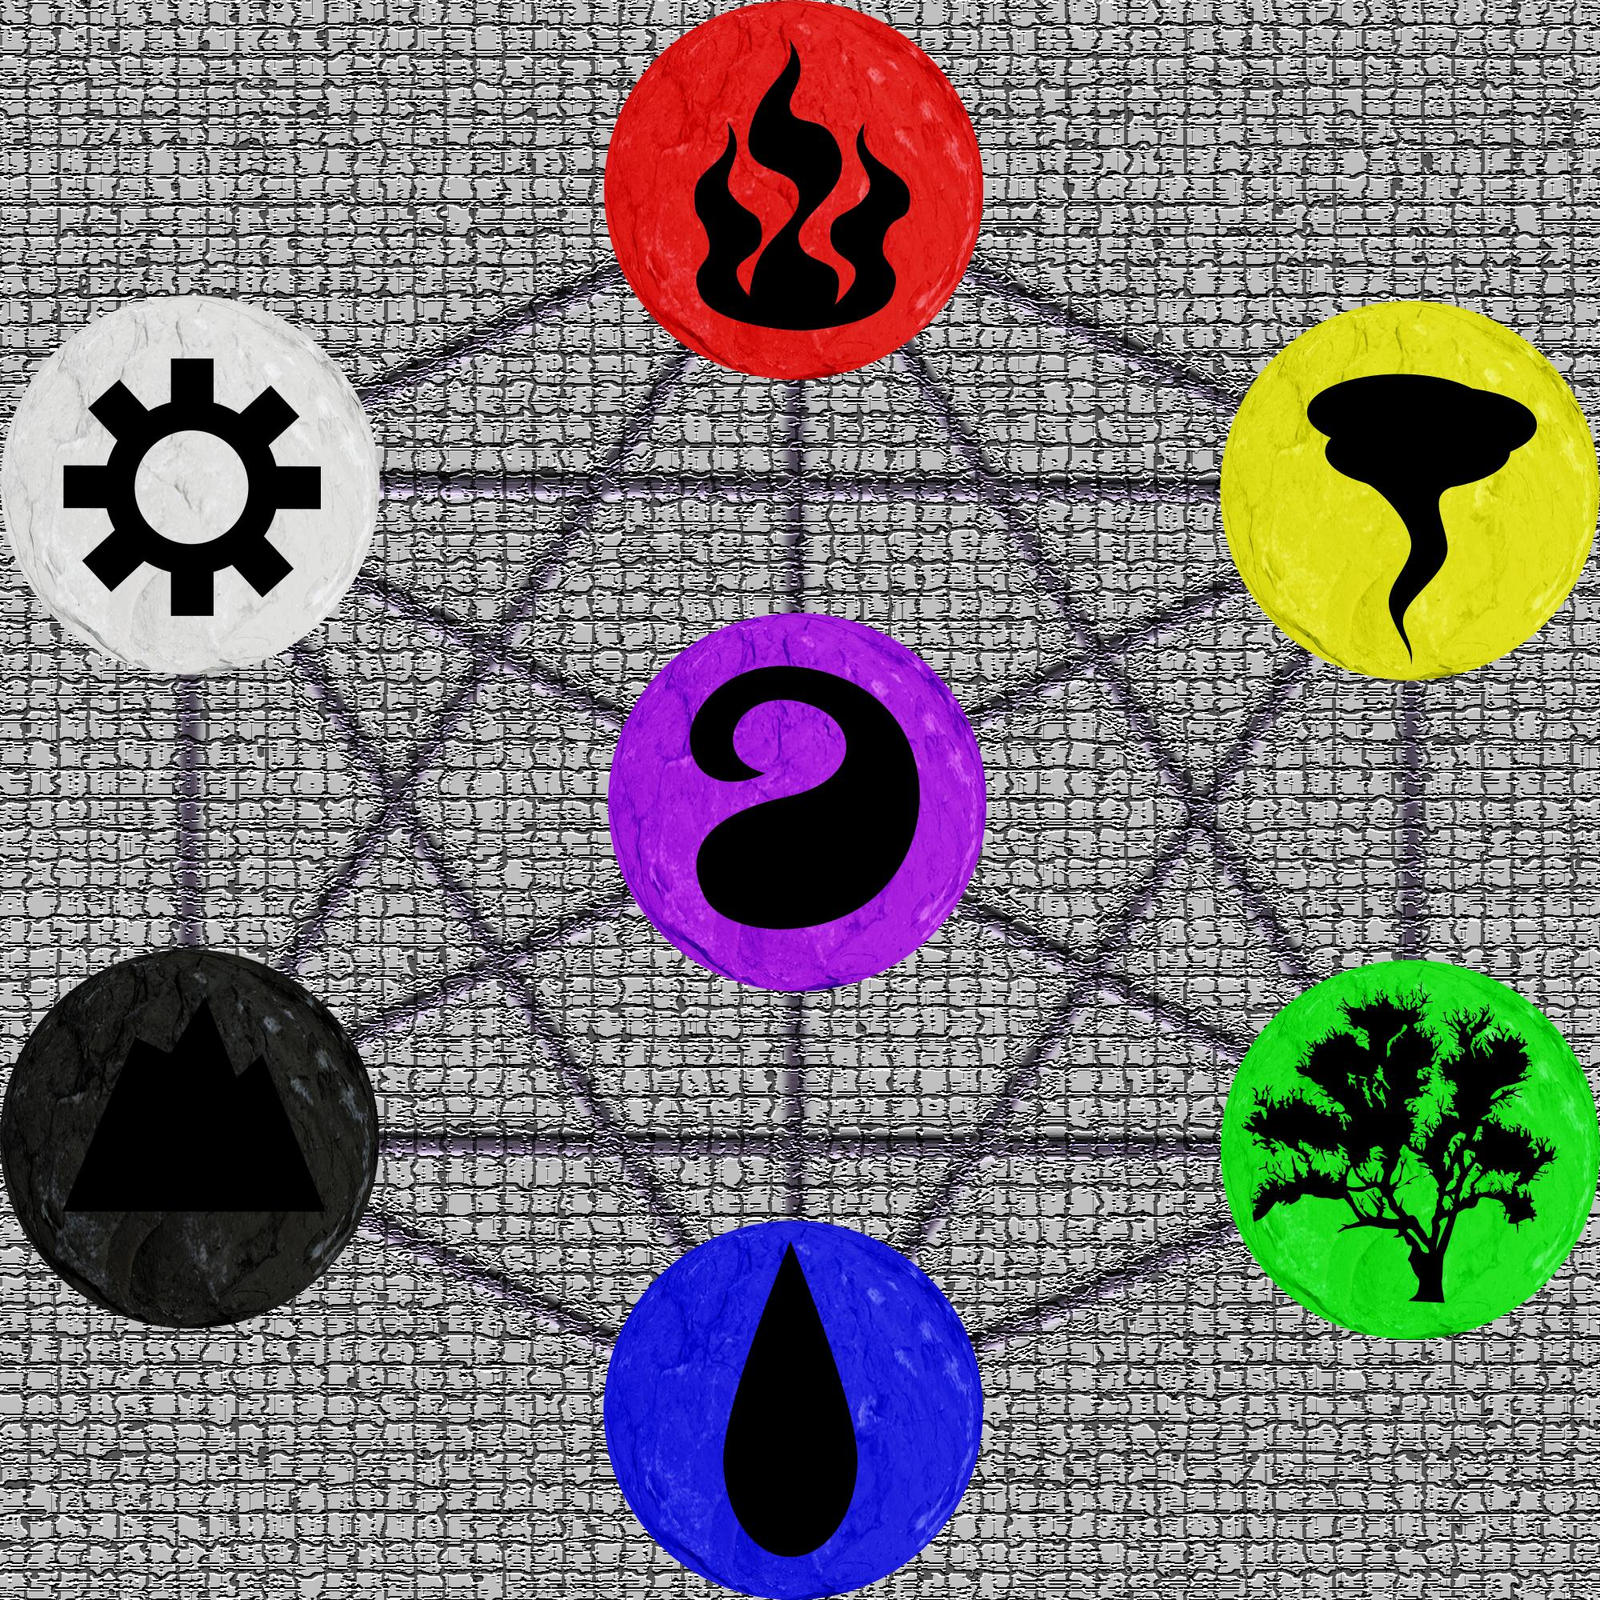 7 Elements Of Art : Elements by facepalmpunch on deviantart